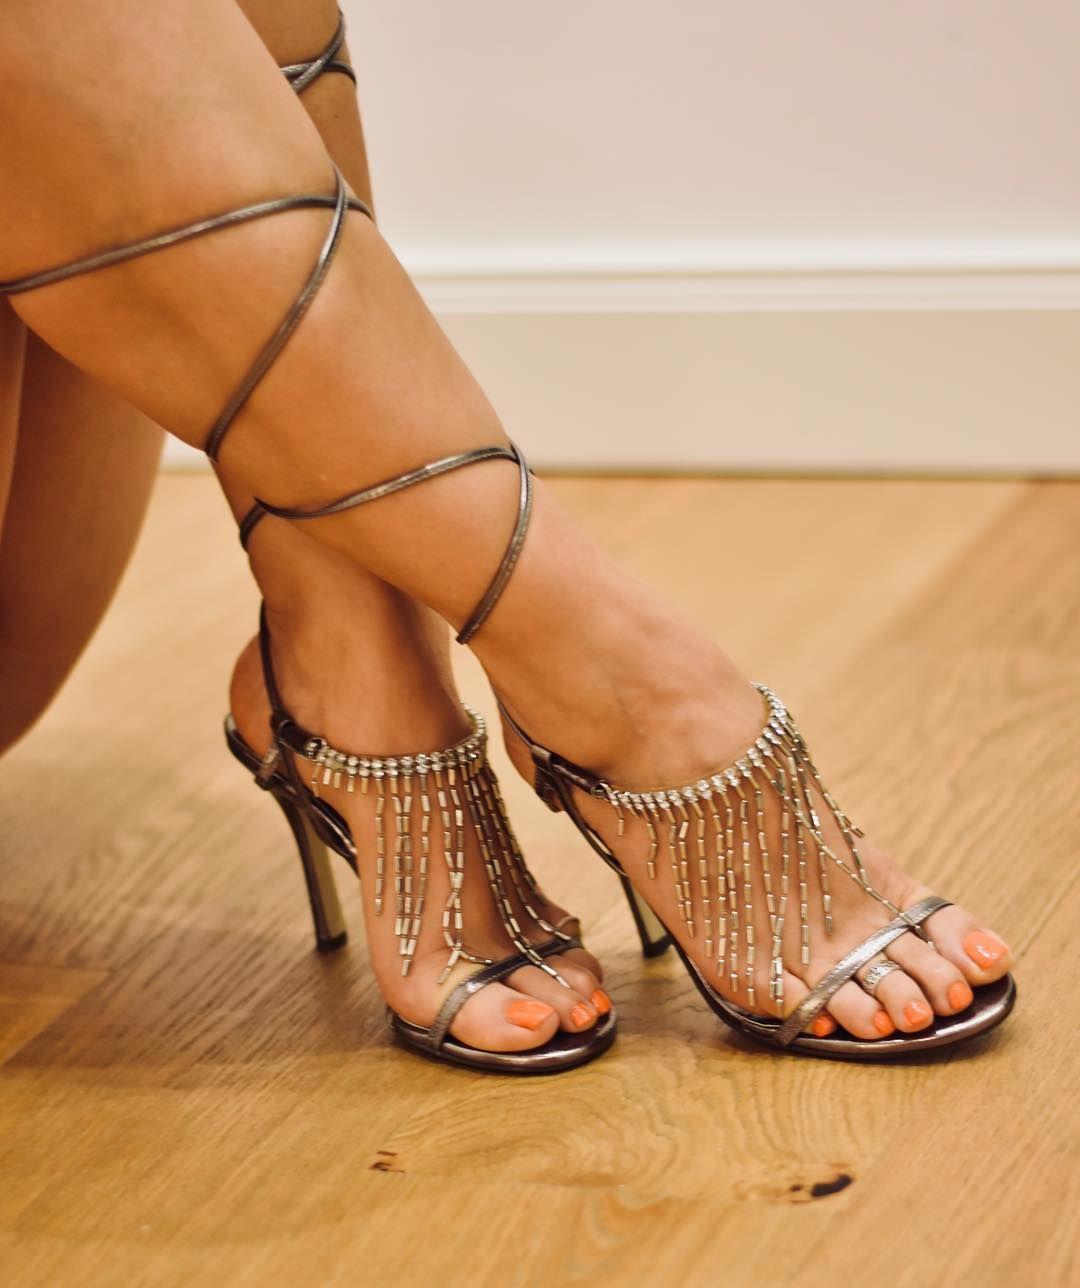 Sarah Hyland Flaunts Feet And Legs In Manning Cartell Mini Dress